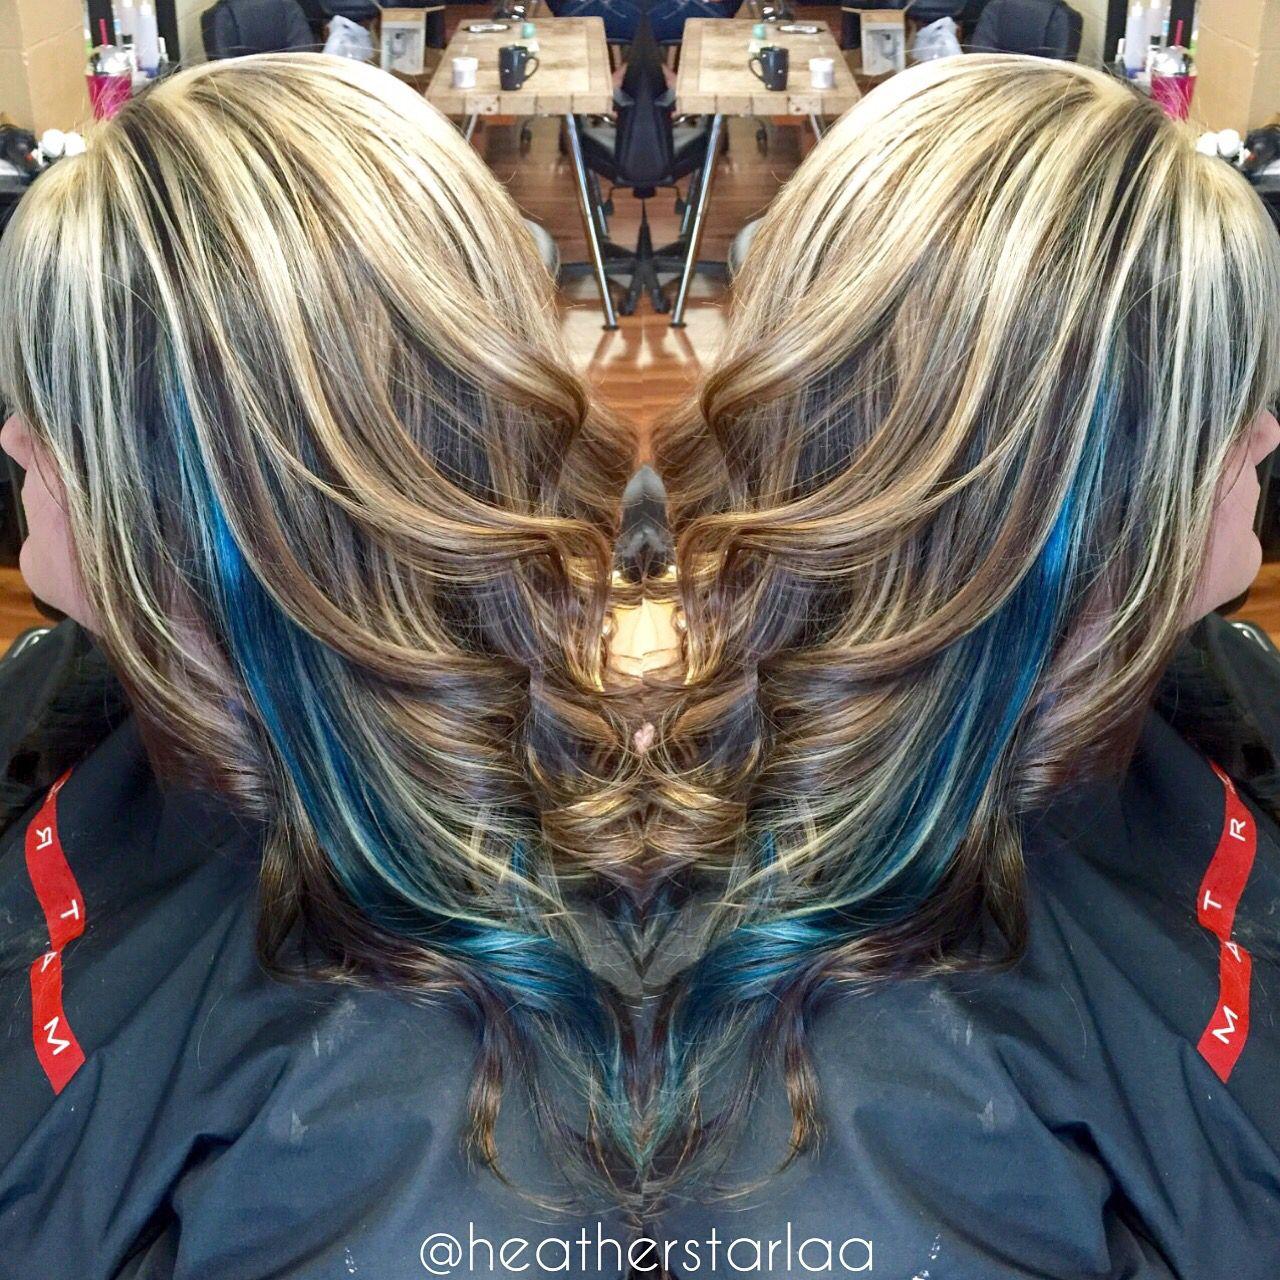 Blonde Highlights With A Dark Brown Base And Blue Peekaboos Blonde Hair Curled Hair Blue Hair Brown Blonde Highlights Blonde And Blue Hair Hair Highlights